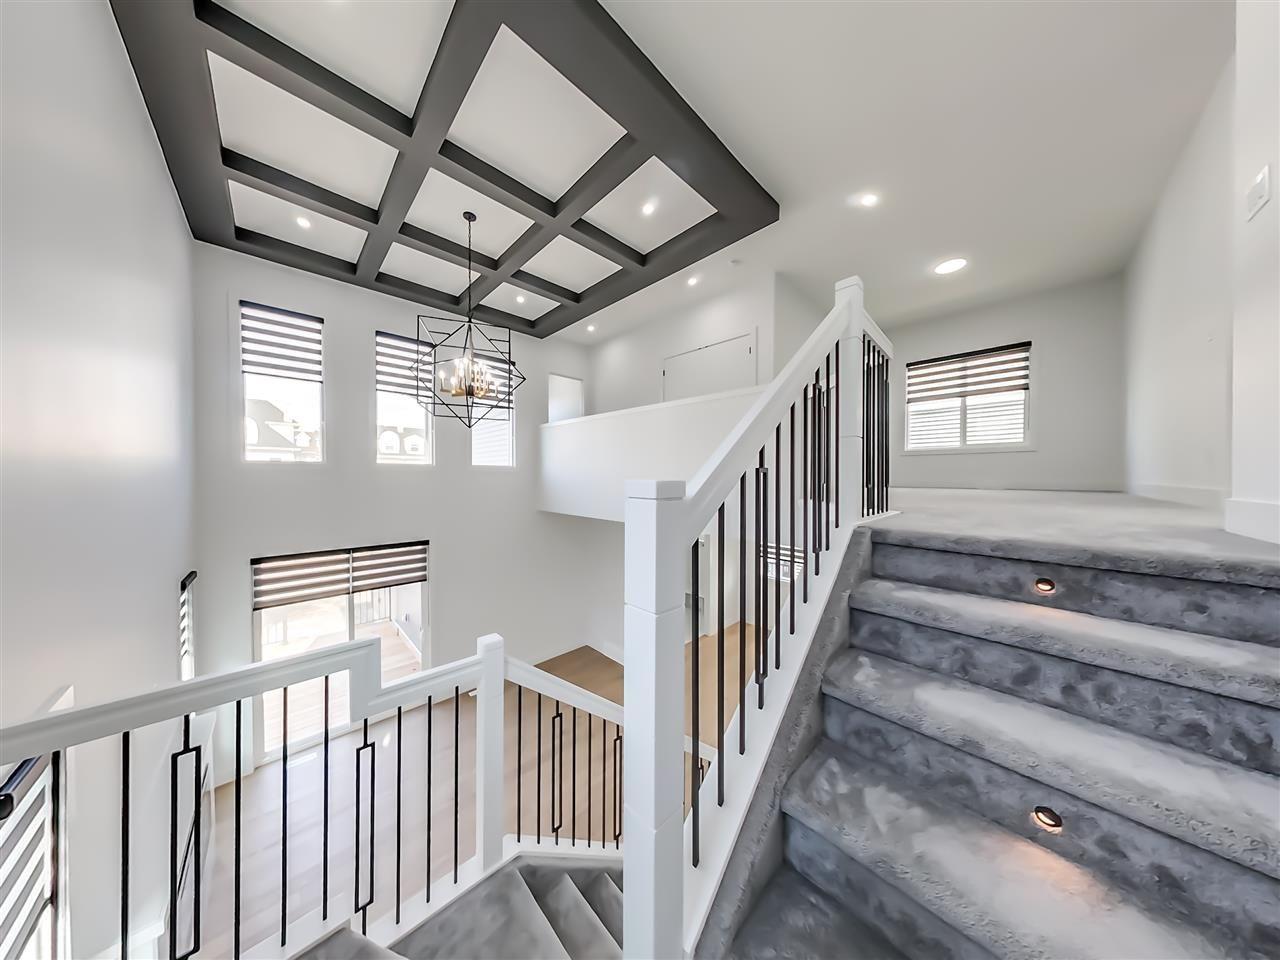 Main Photo: 7314 Morgan Road in Edmonton: Zone 27 House for sale : MLS®# E4234045